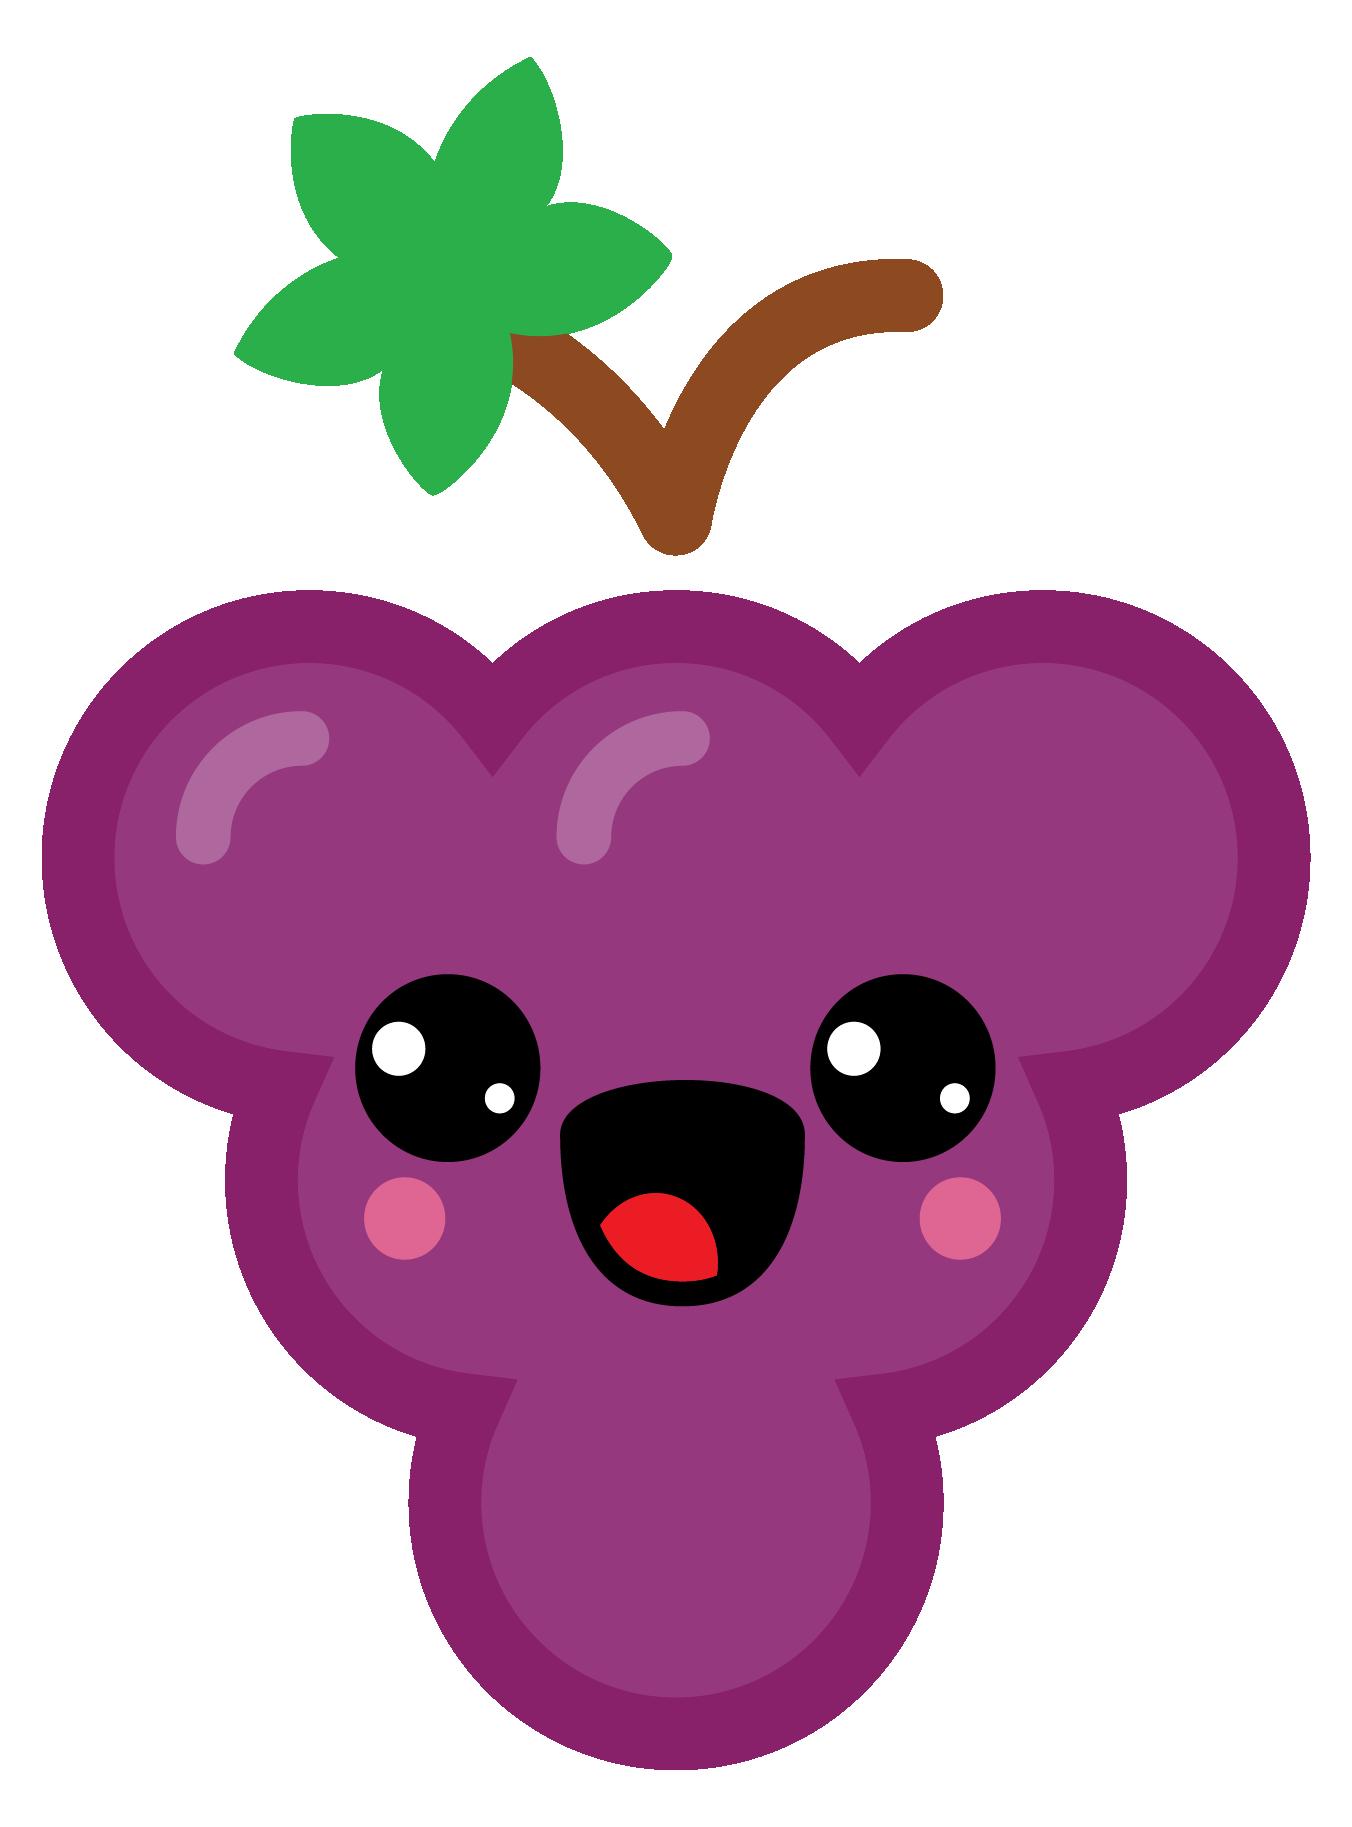 cartoon icon of fruit